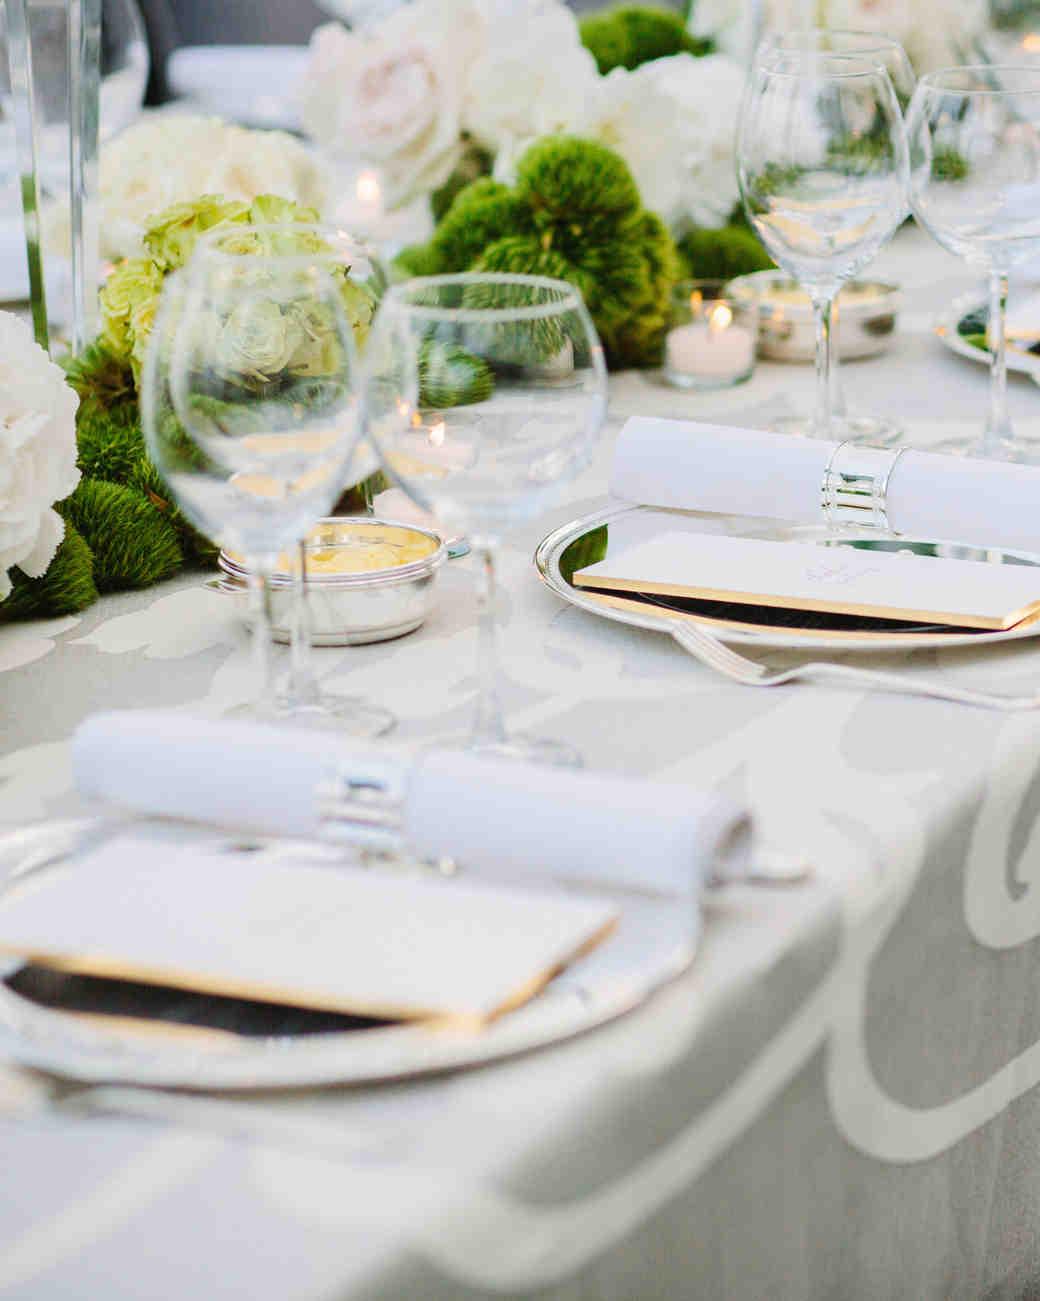 5-redbliss-design-wedding-table-0116.jpg